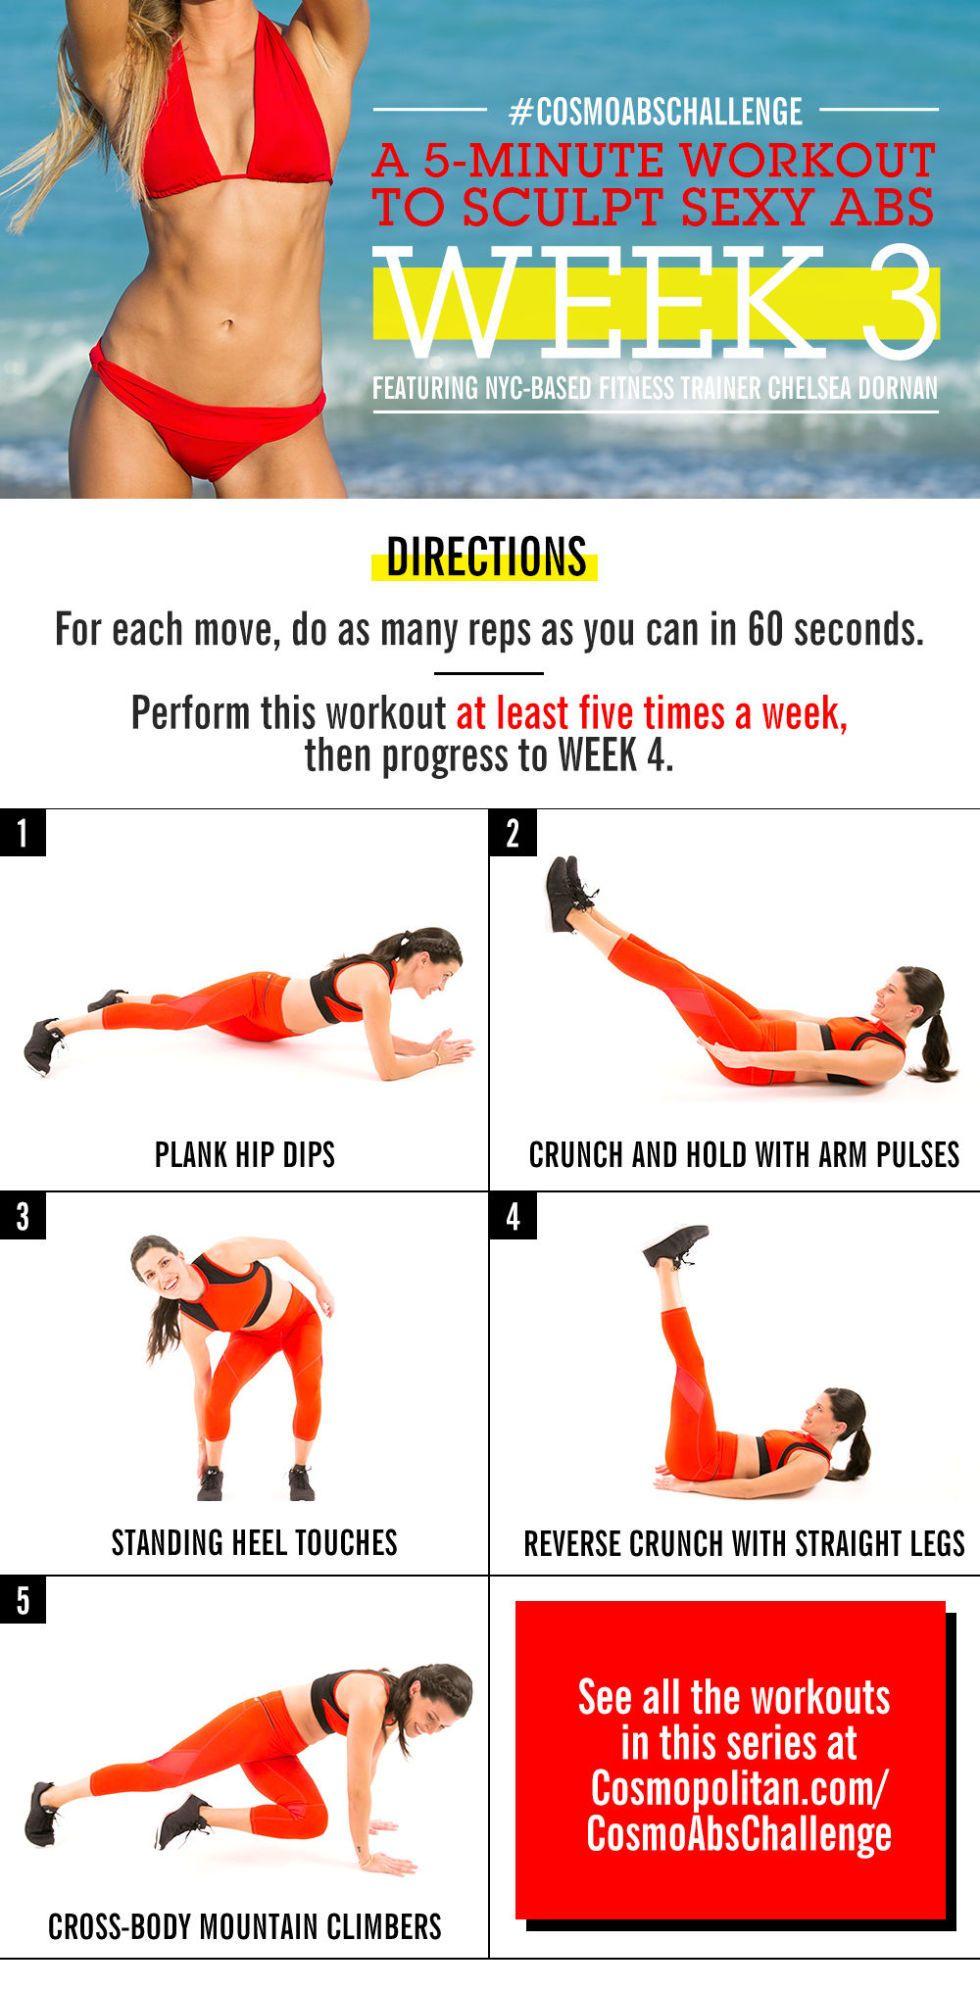 Ab workout 4 weeks postpartum sexual health